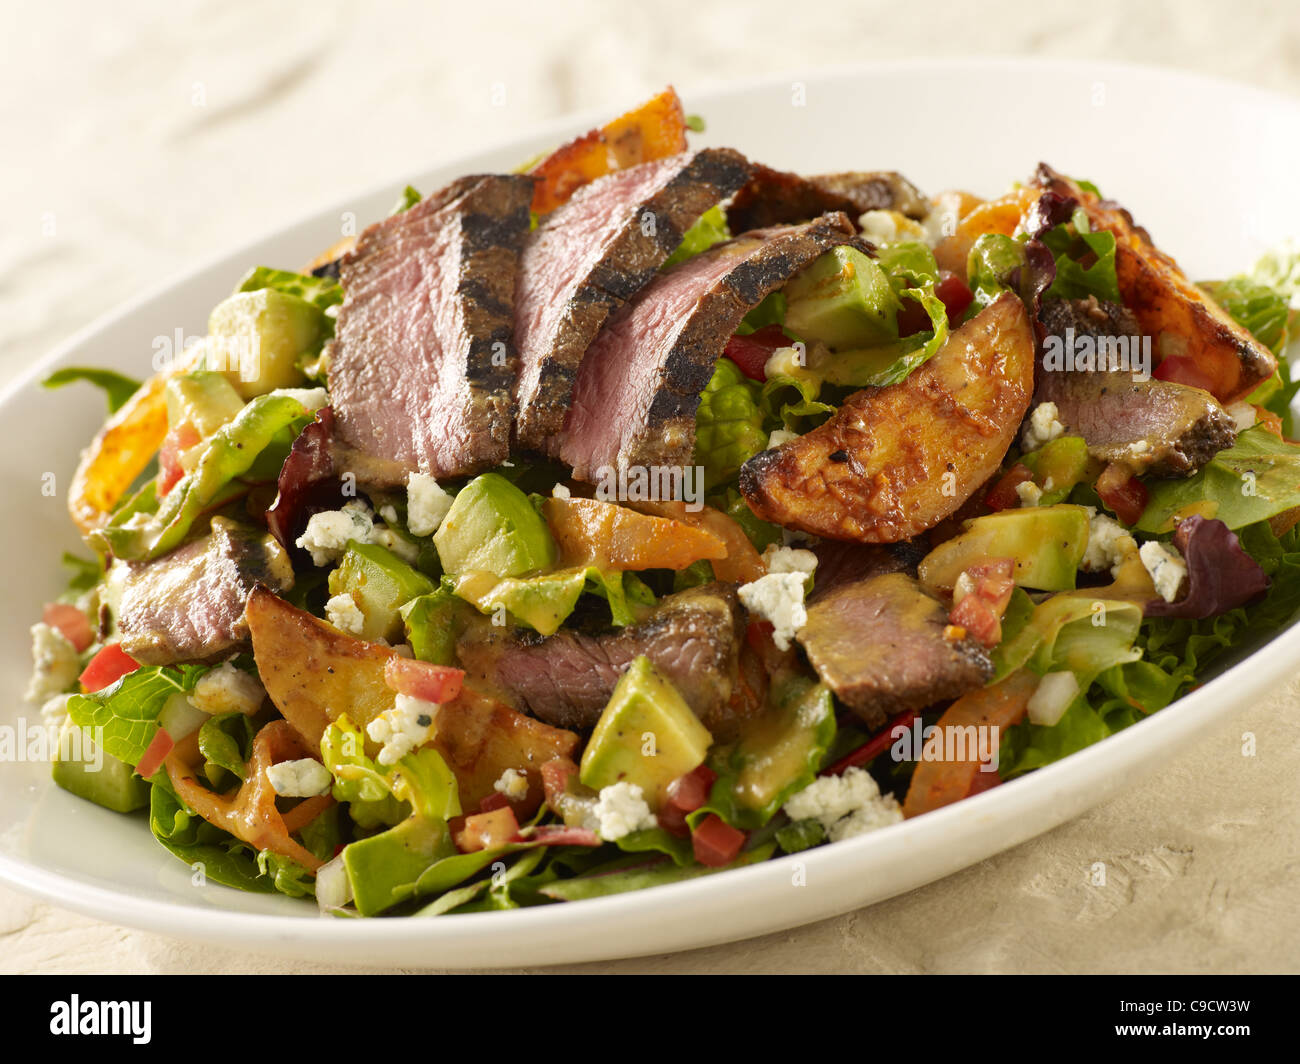 Grilled steak and potato salad Stock Photo